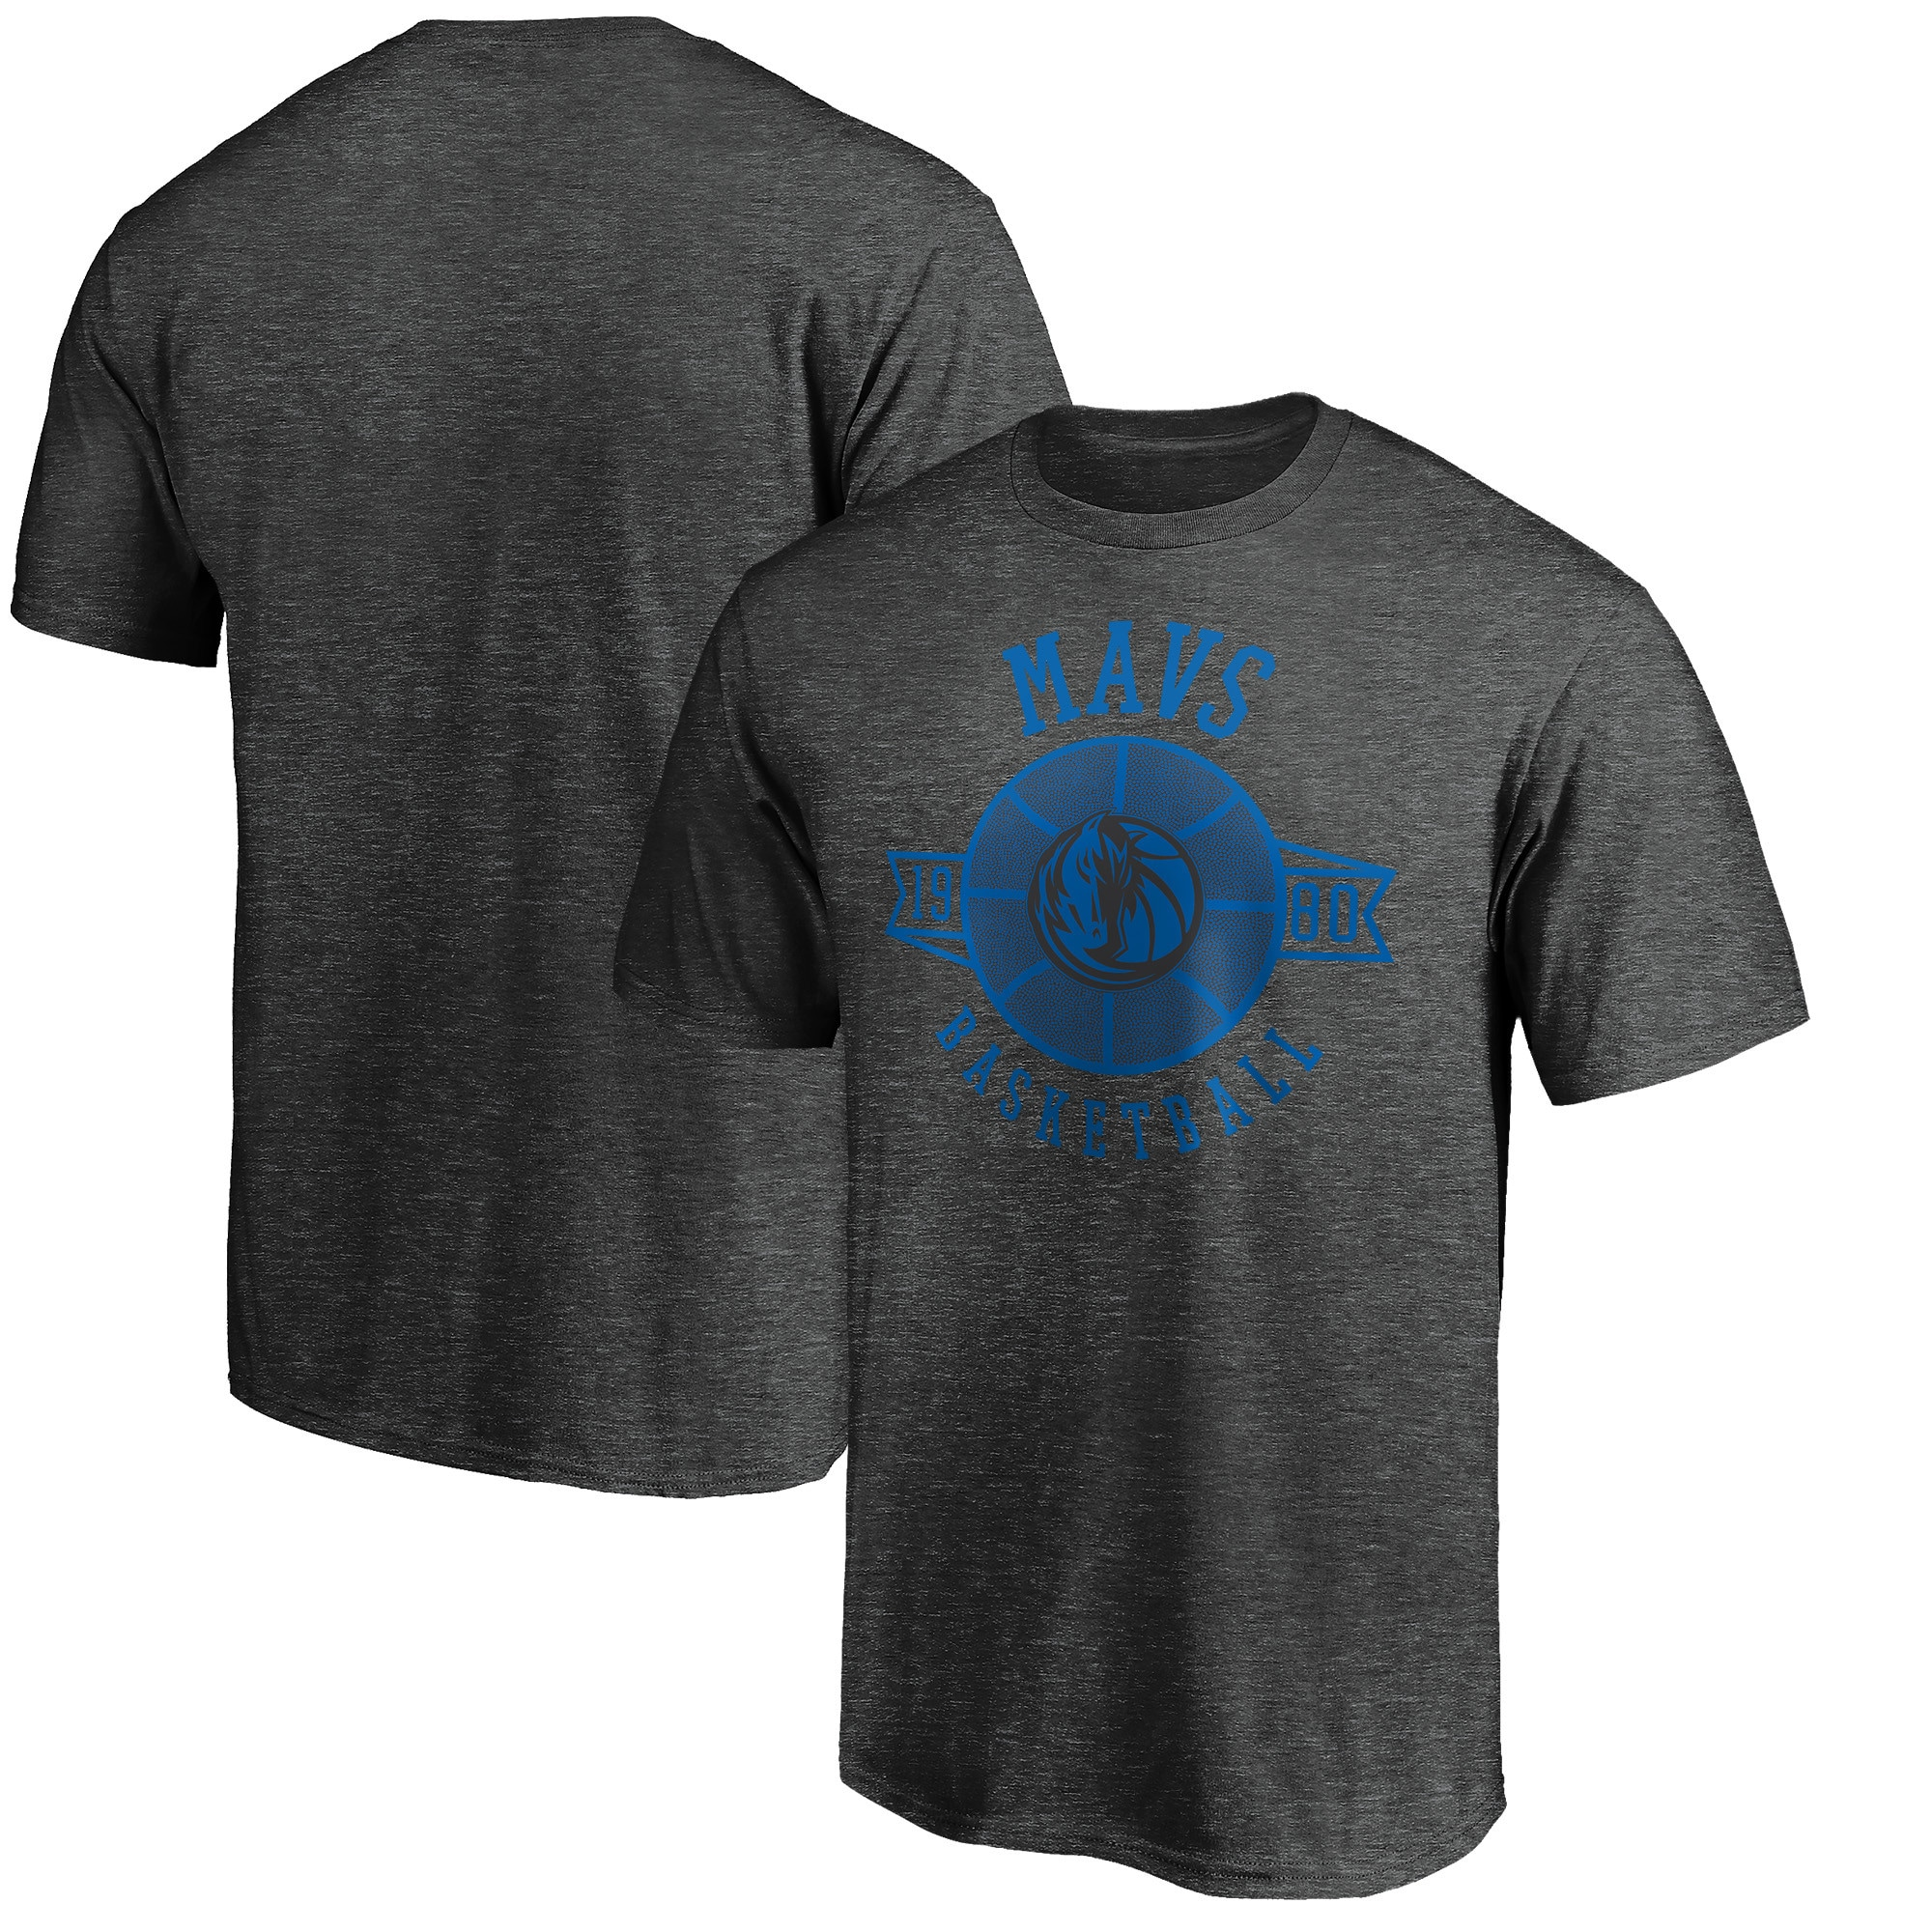 Dallas Mavericks Fanatics Branded Showtime International Foul T-Shirt - Heathered Charcoal